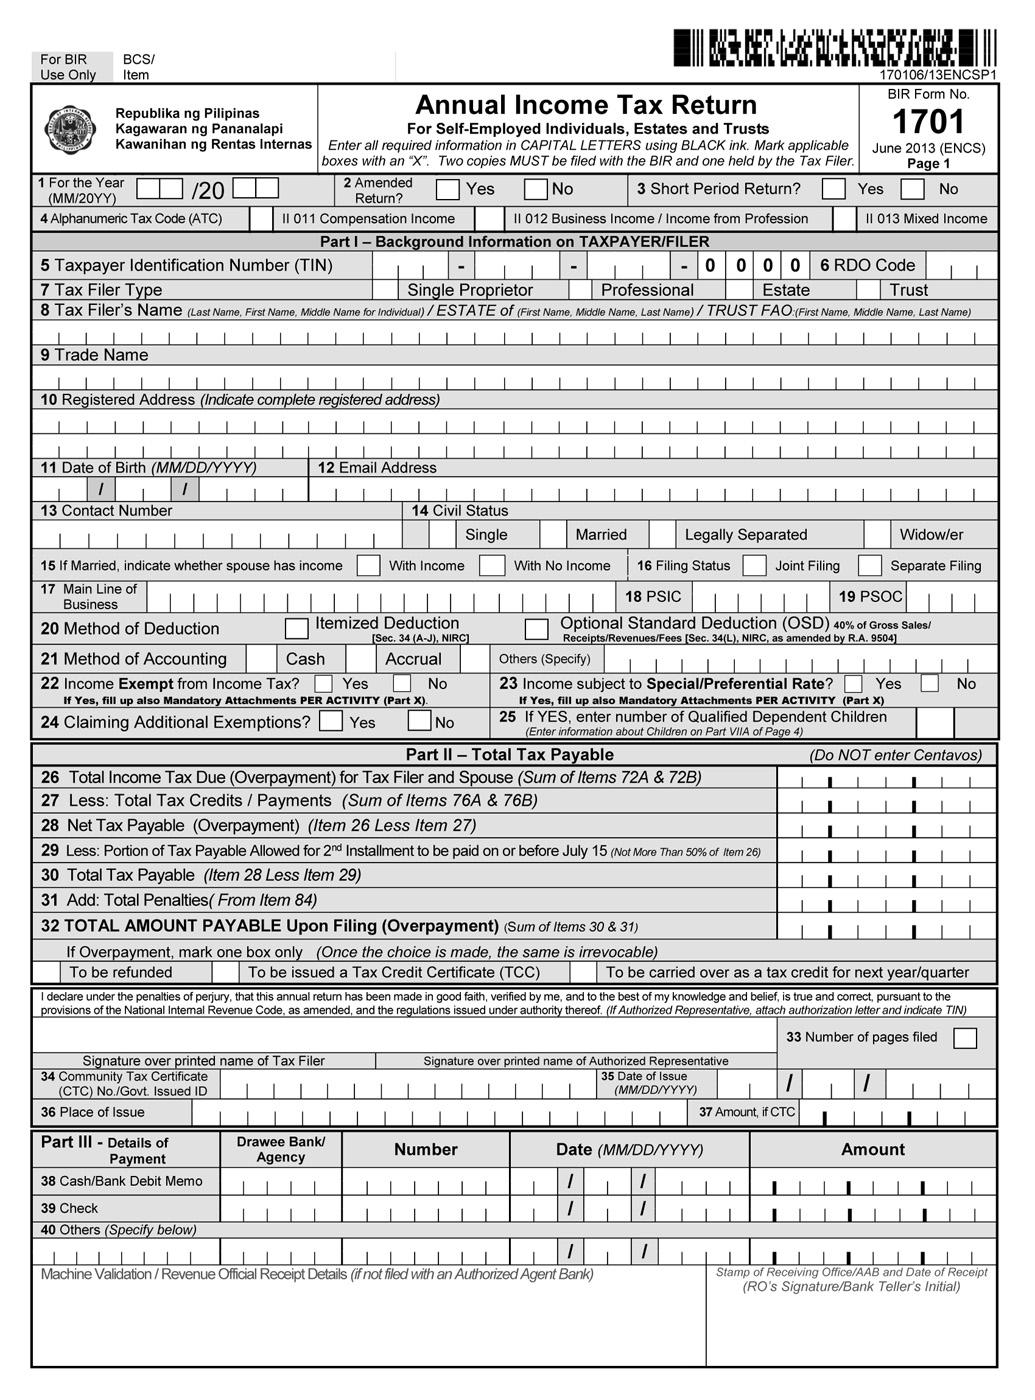 busapcom: BIR Form 1701 Download